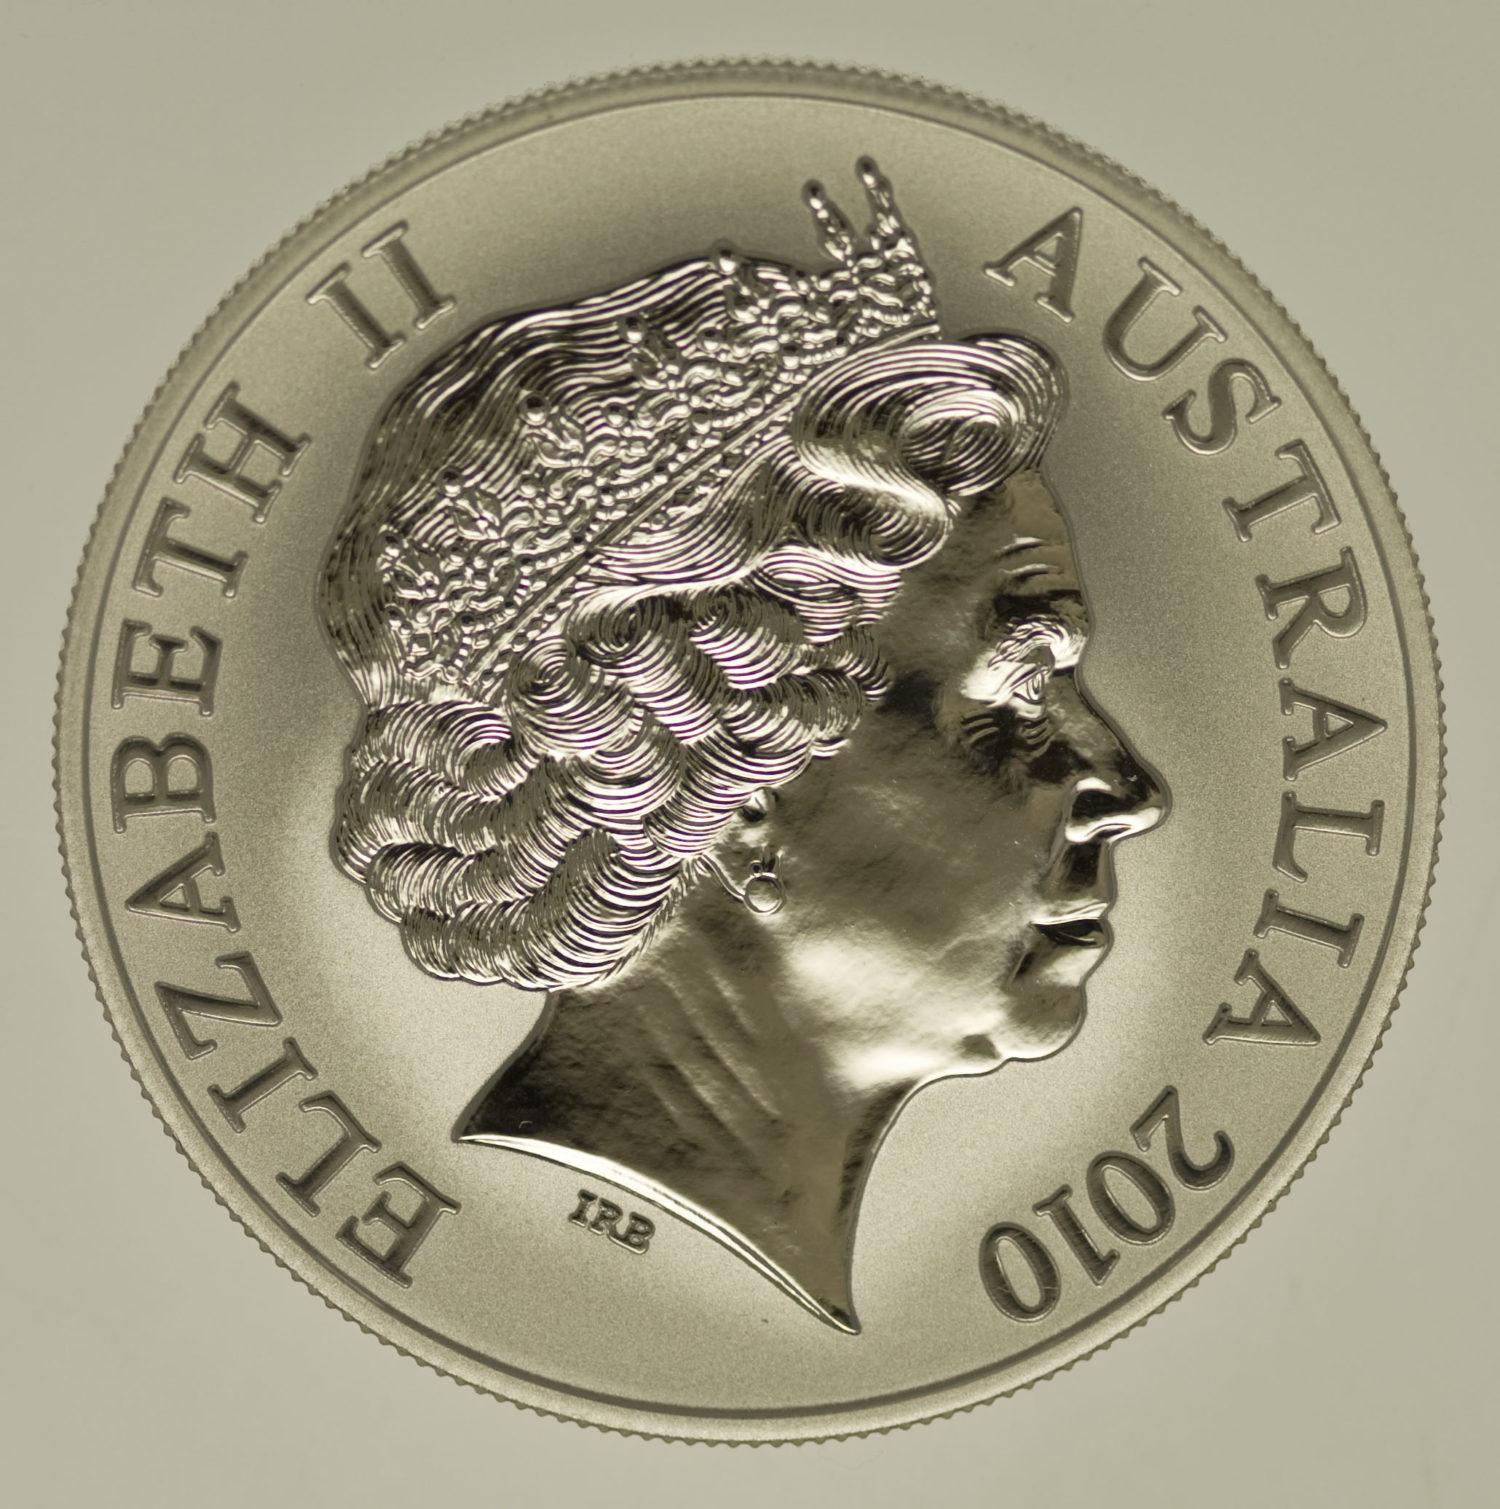 australien-silbermuenzen-uebrige-welt - Australien RAM 1 Dollar 2010 Känguru